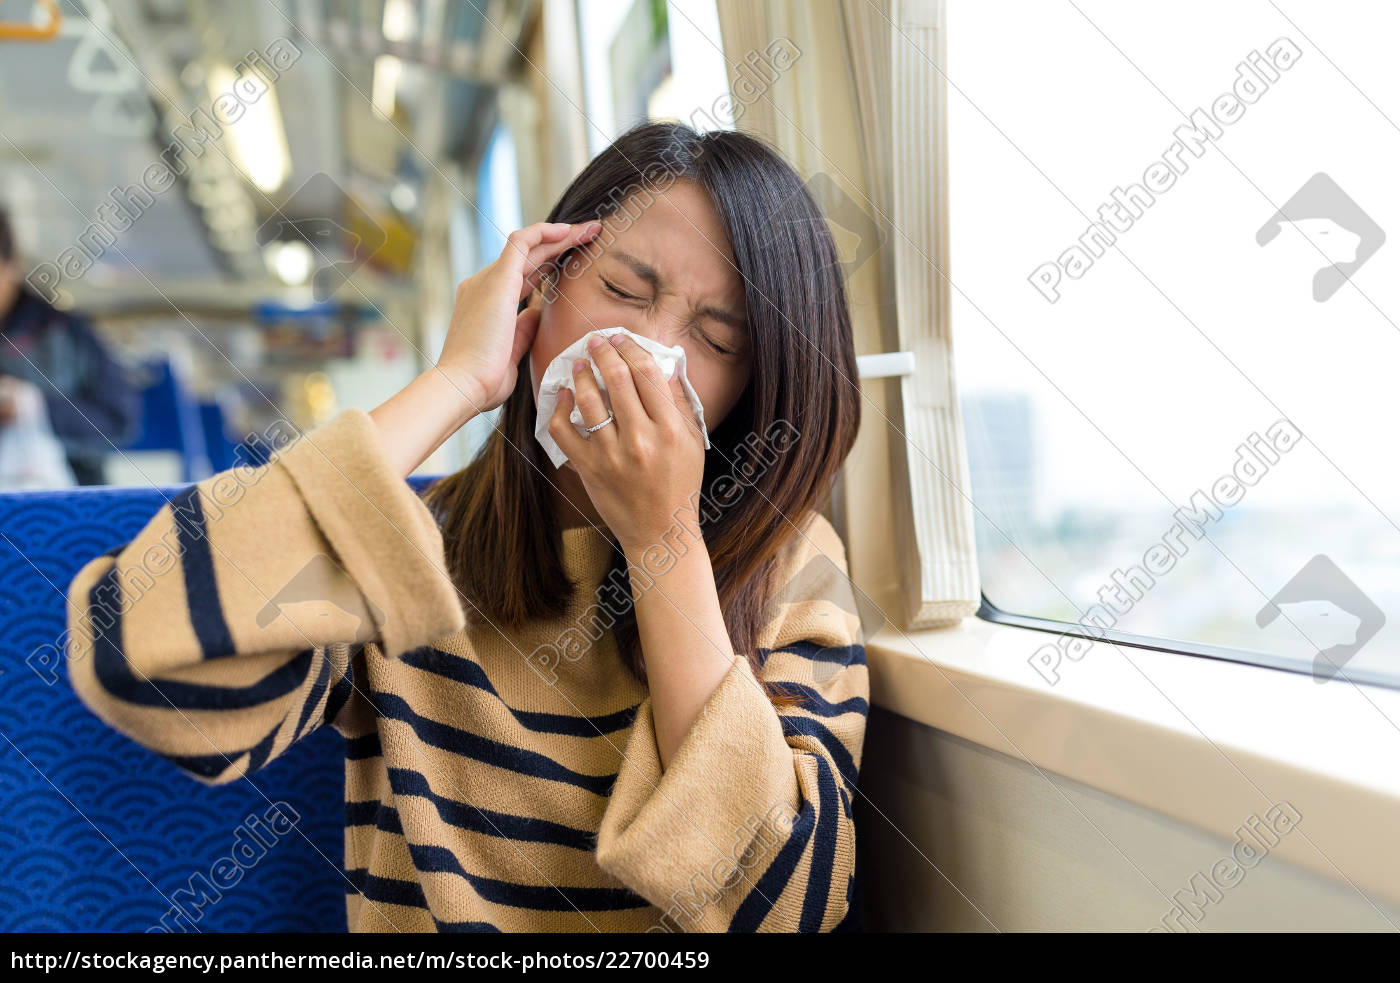 woman, suffer, from, sick, inside, train - 22700459